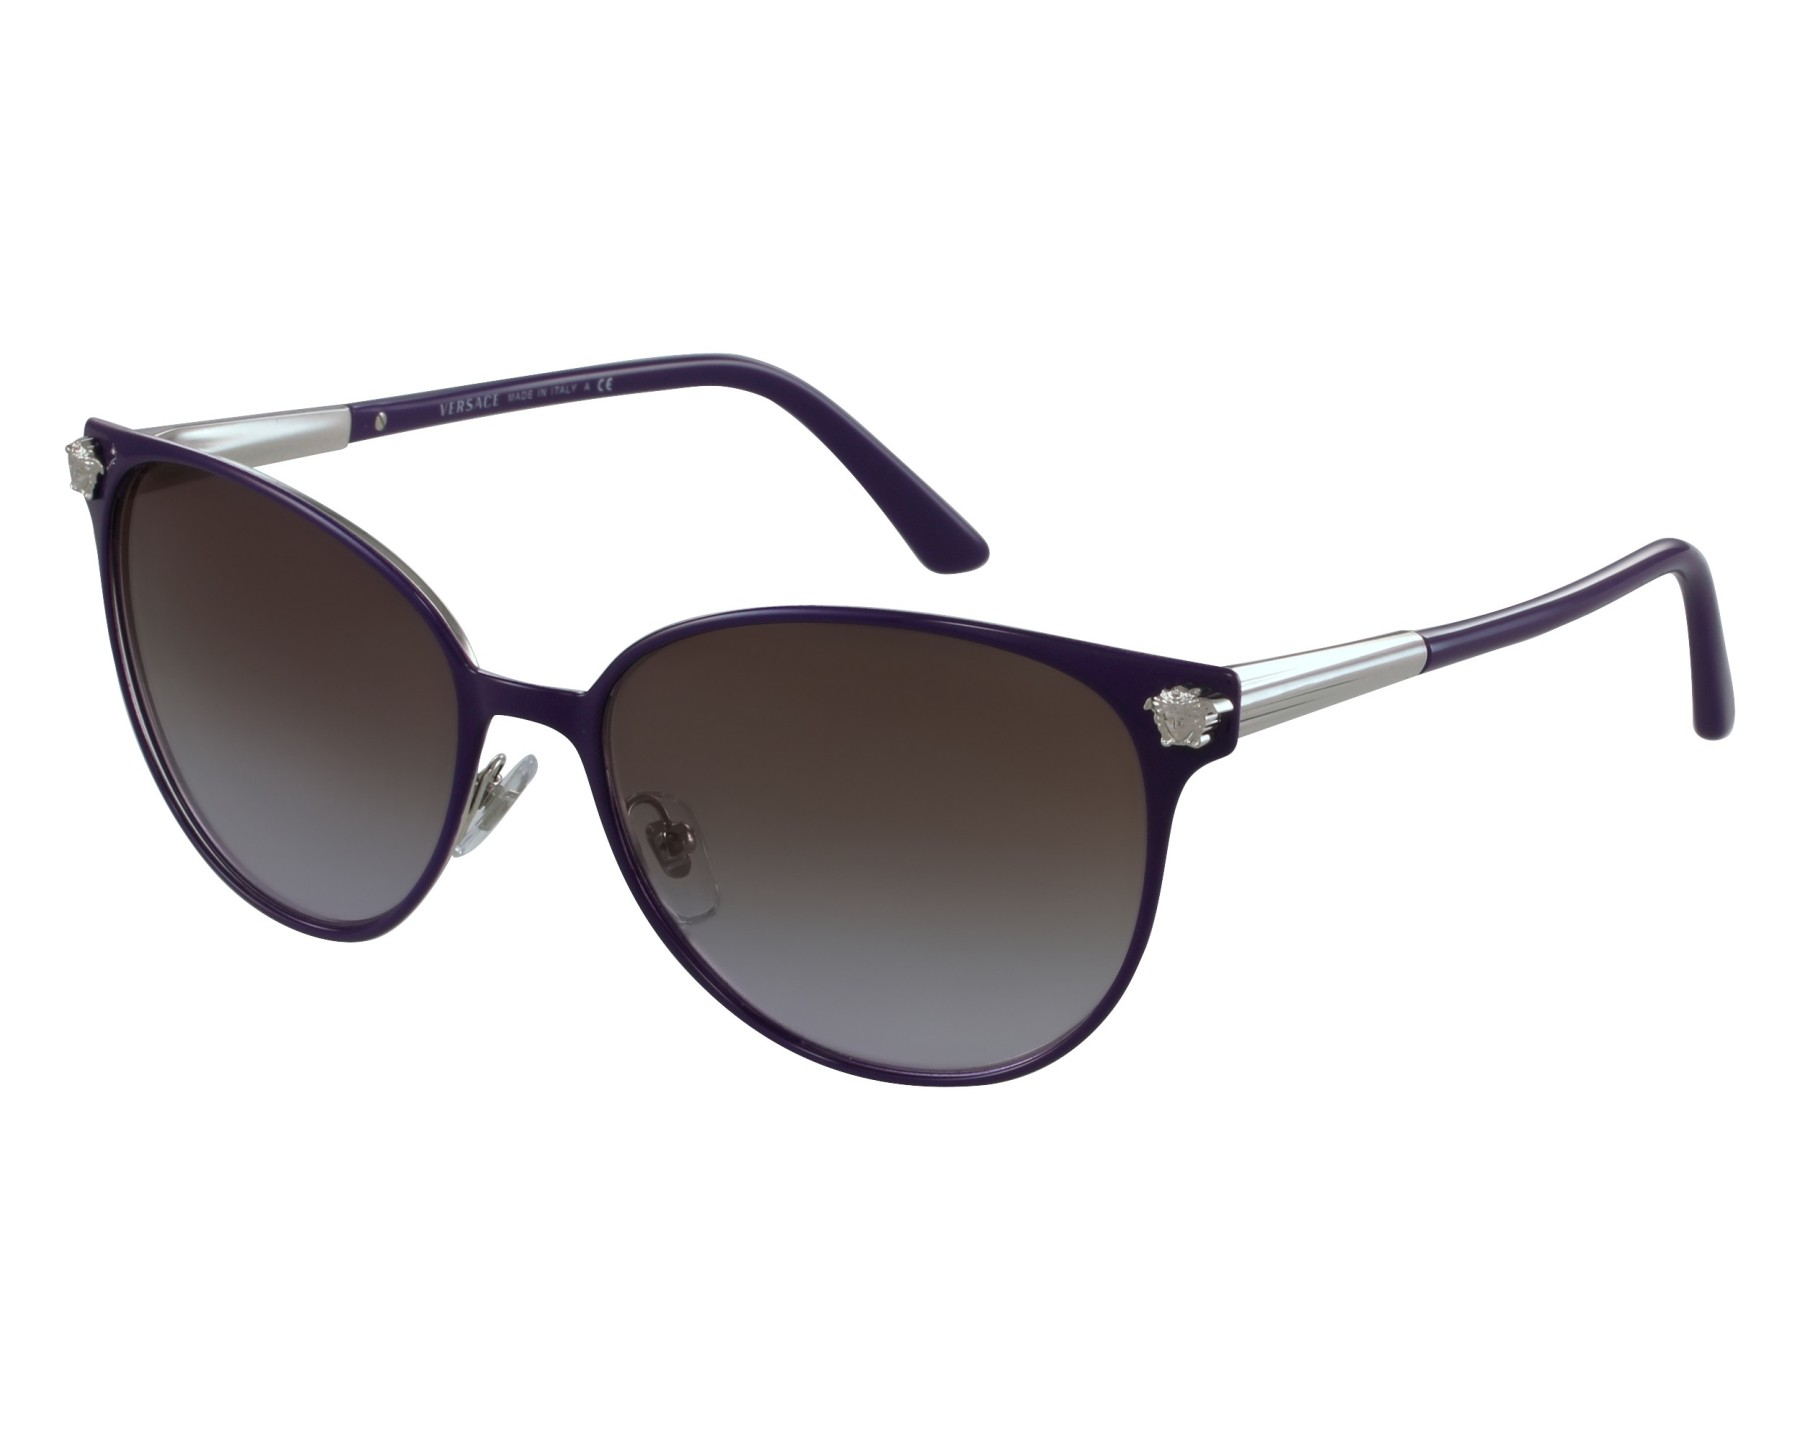 1d26be2f24 main image main image Source · Versace VE 2168 1376 68 Sunglasses ...